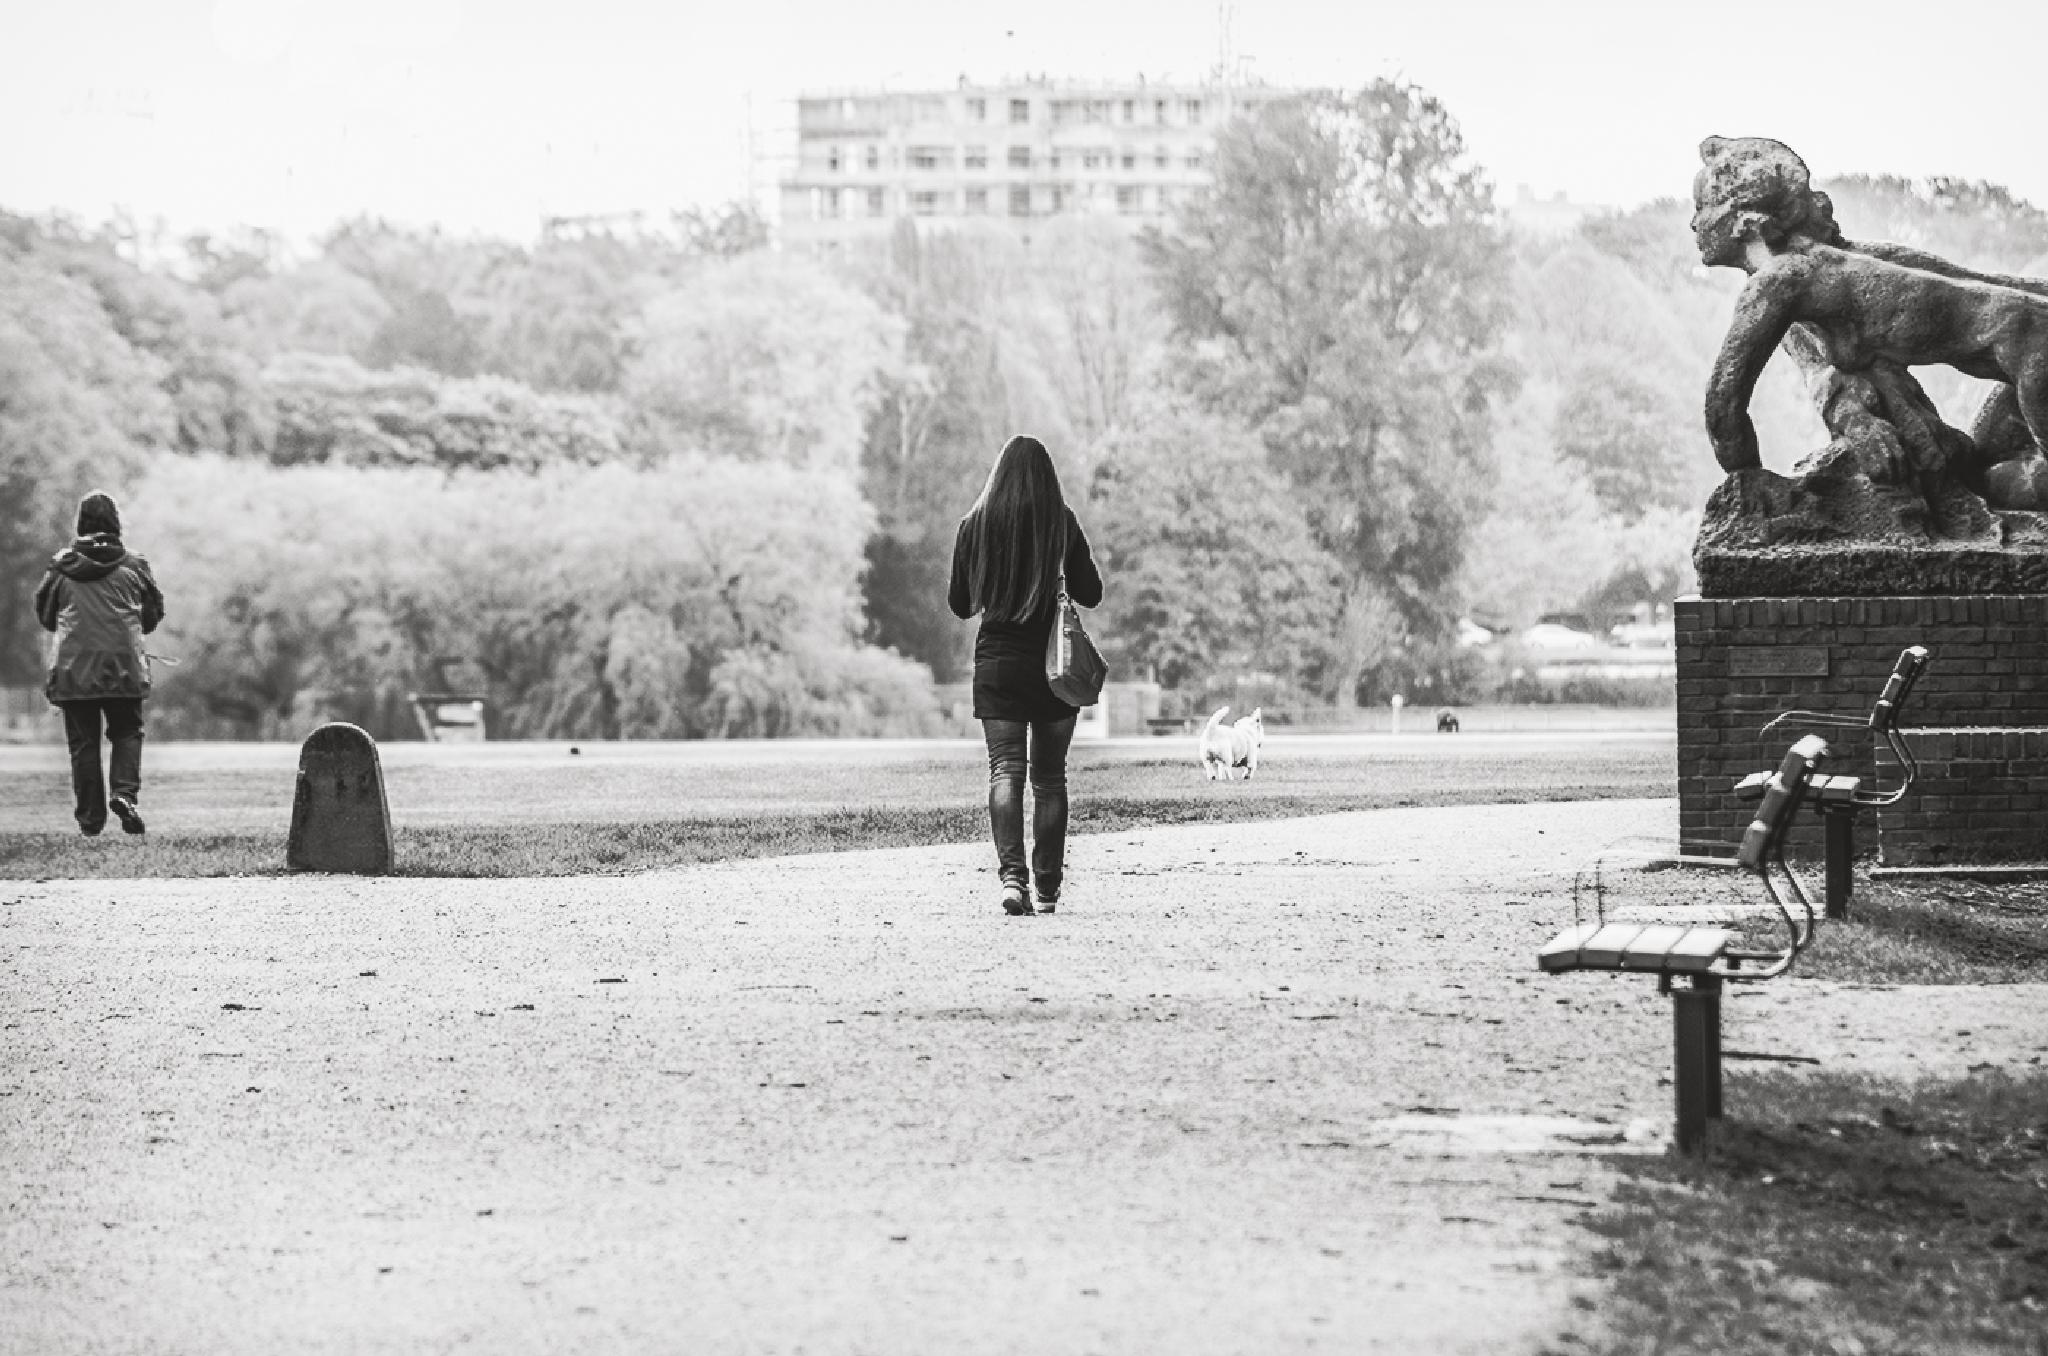 Maitag im Stadtpark by Michael Krämer